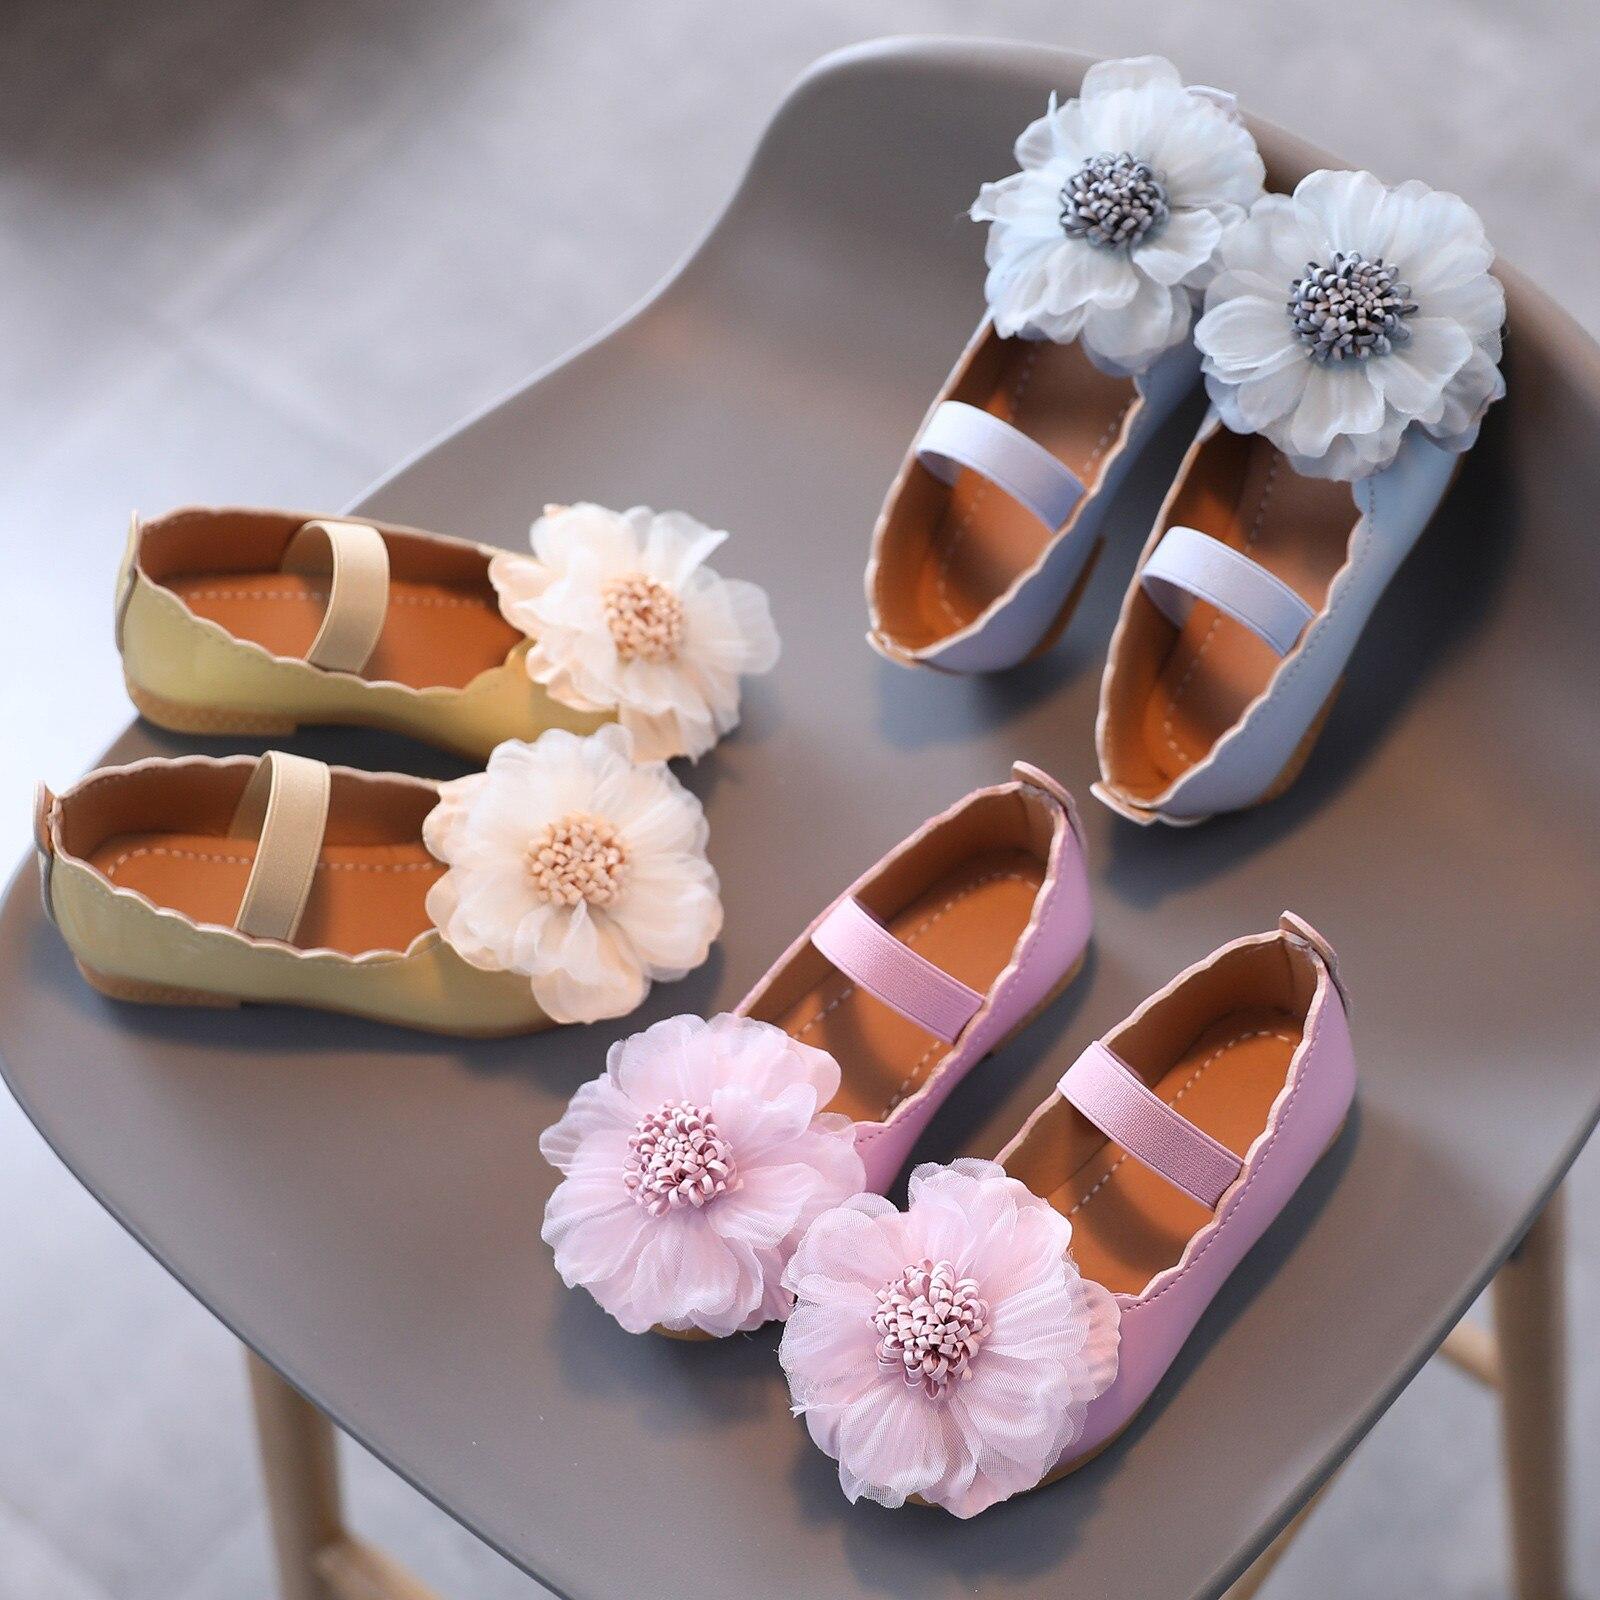 Zapatos de princesa individual con flores para niñas pequeñas, sandalias de suela...